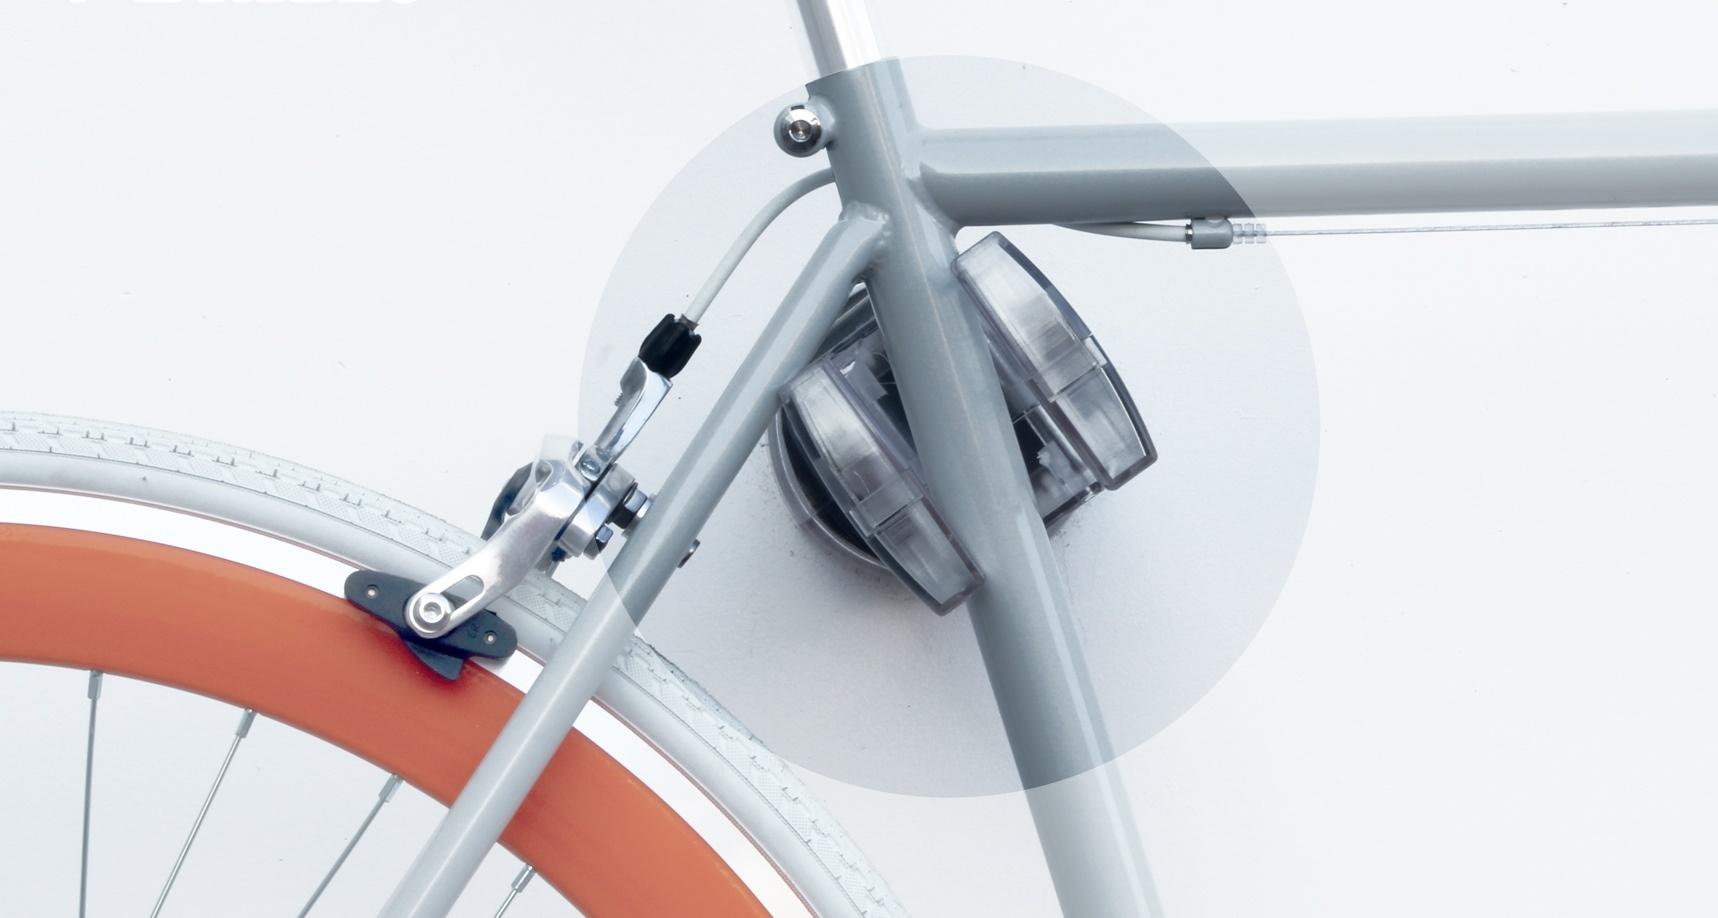 Peruzzo Cool Bike Rack 405 / T Wall Holder Transparent ...